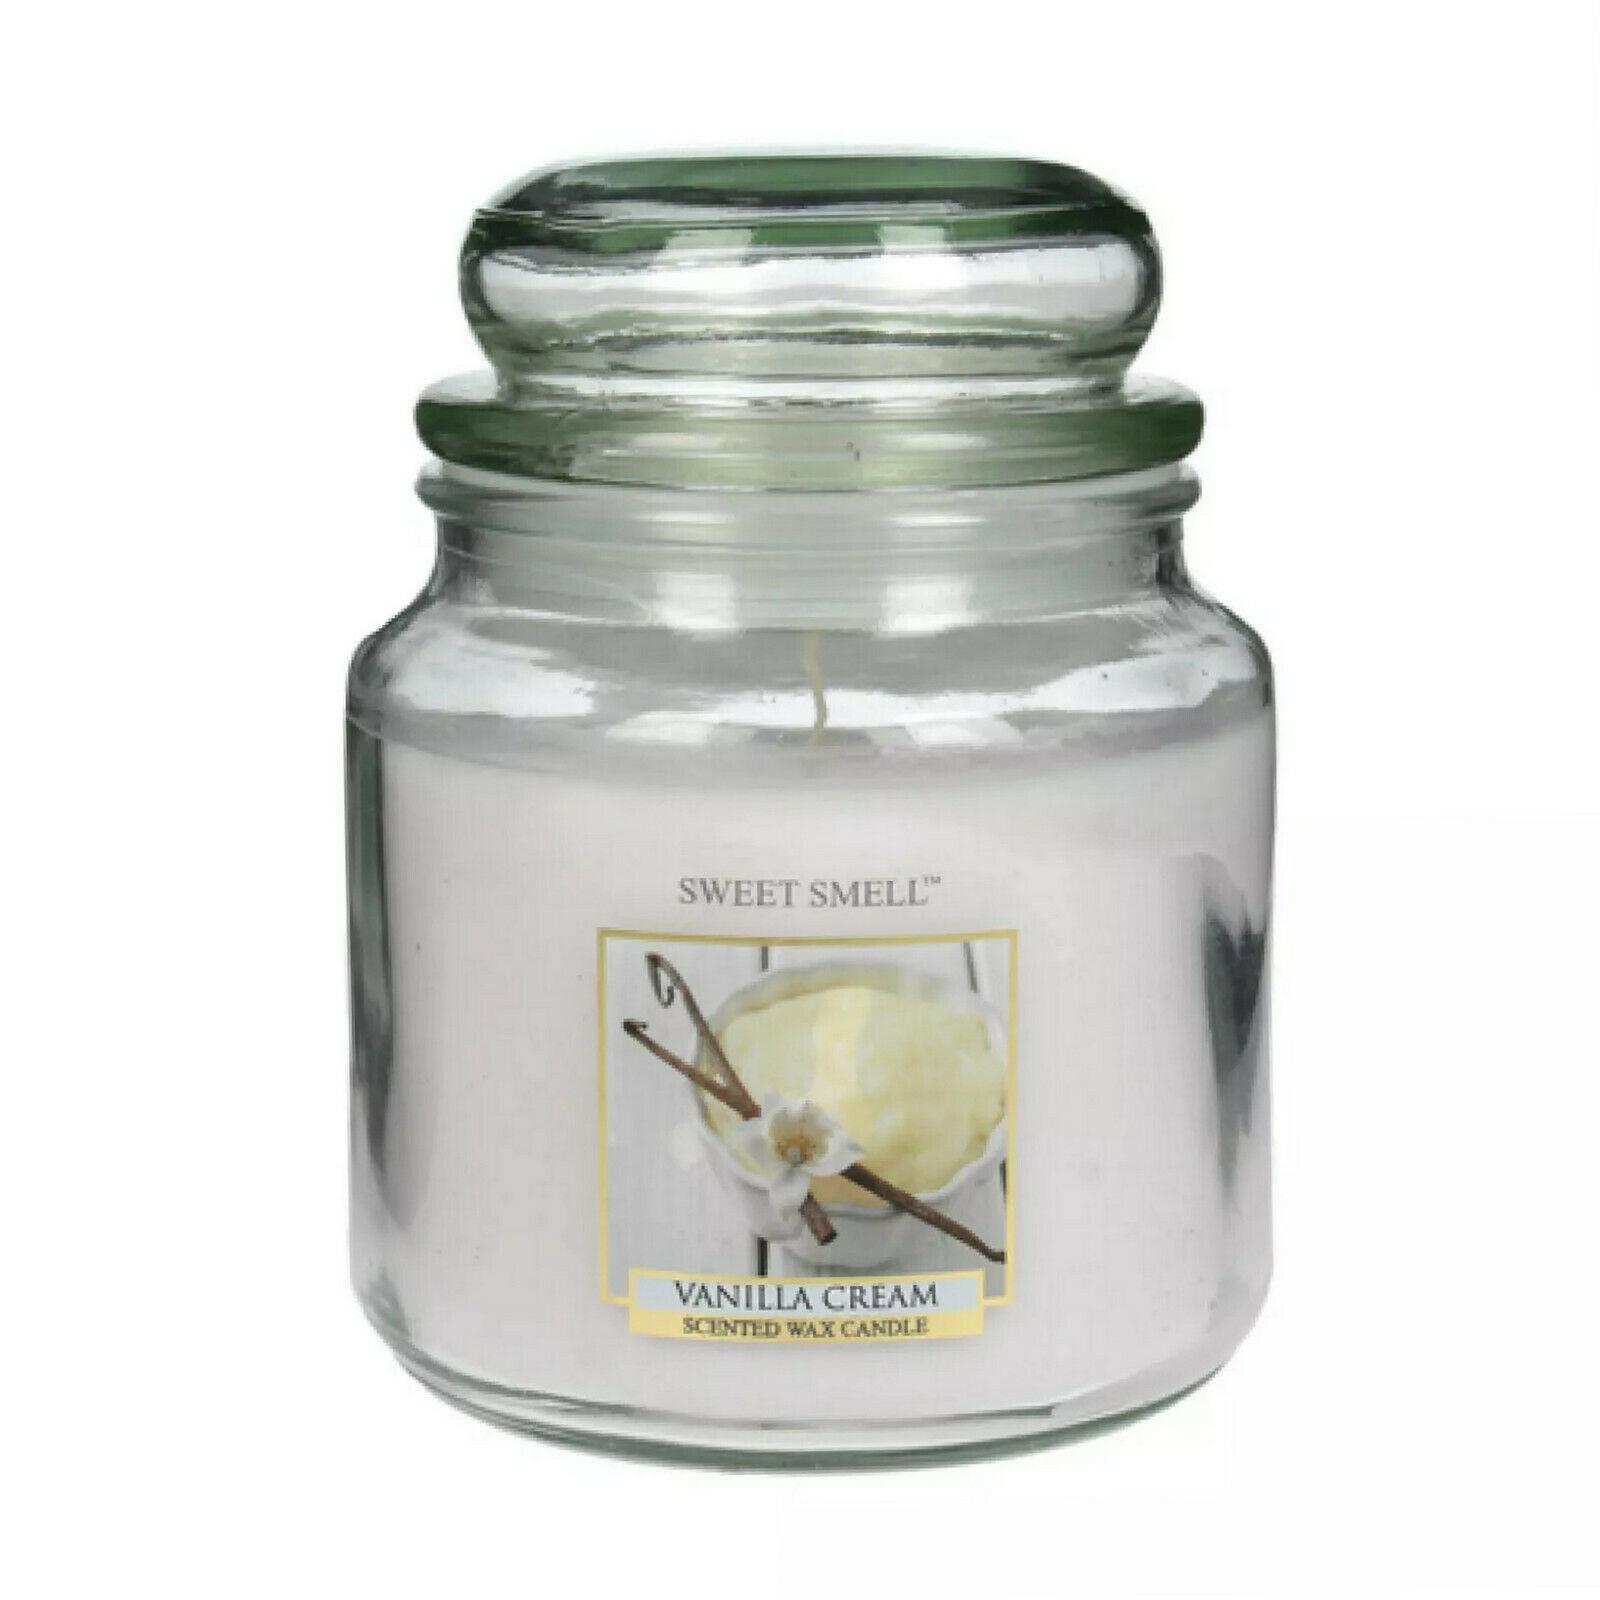 SWEET SMELL Duftkerze im Glas 135x100 mm 426g Wachs Medium Kerzenglas mit Deckel